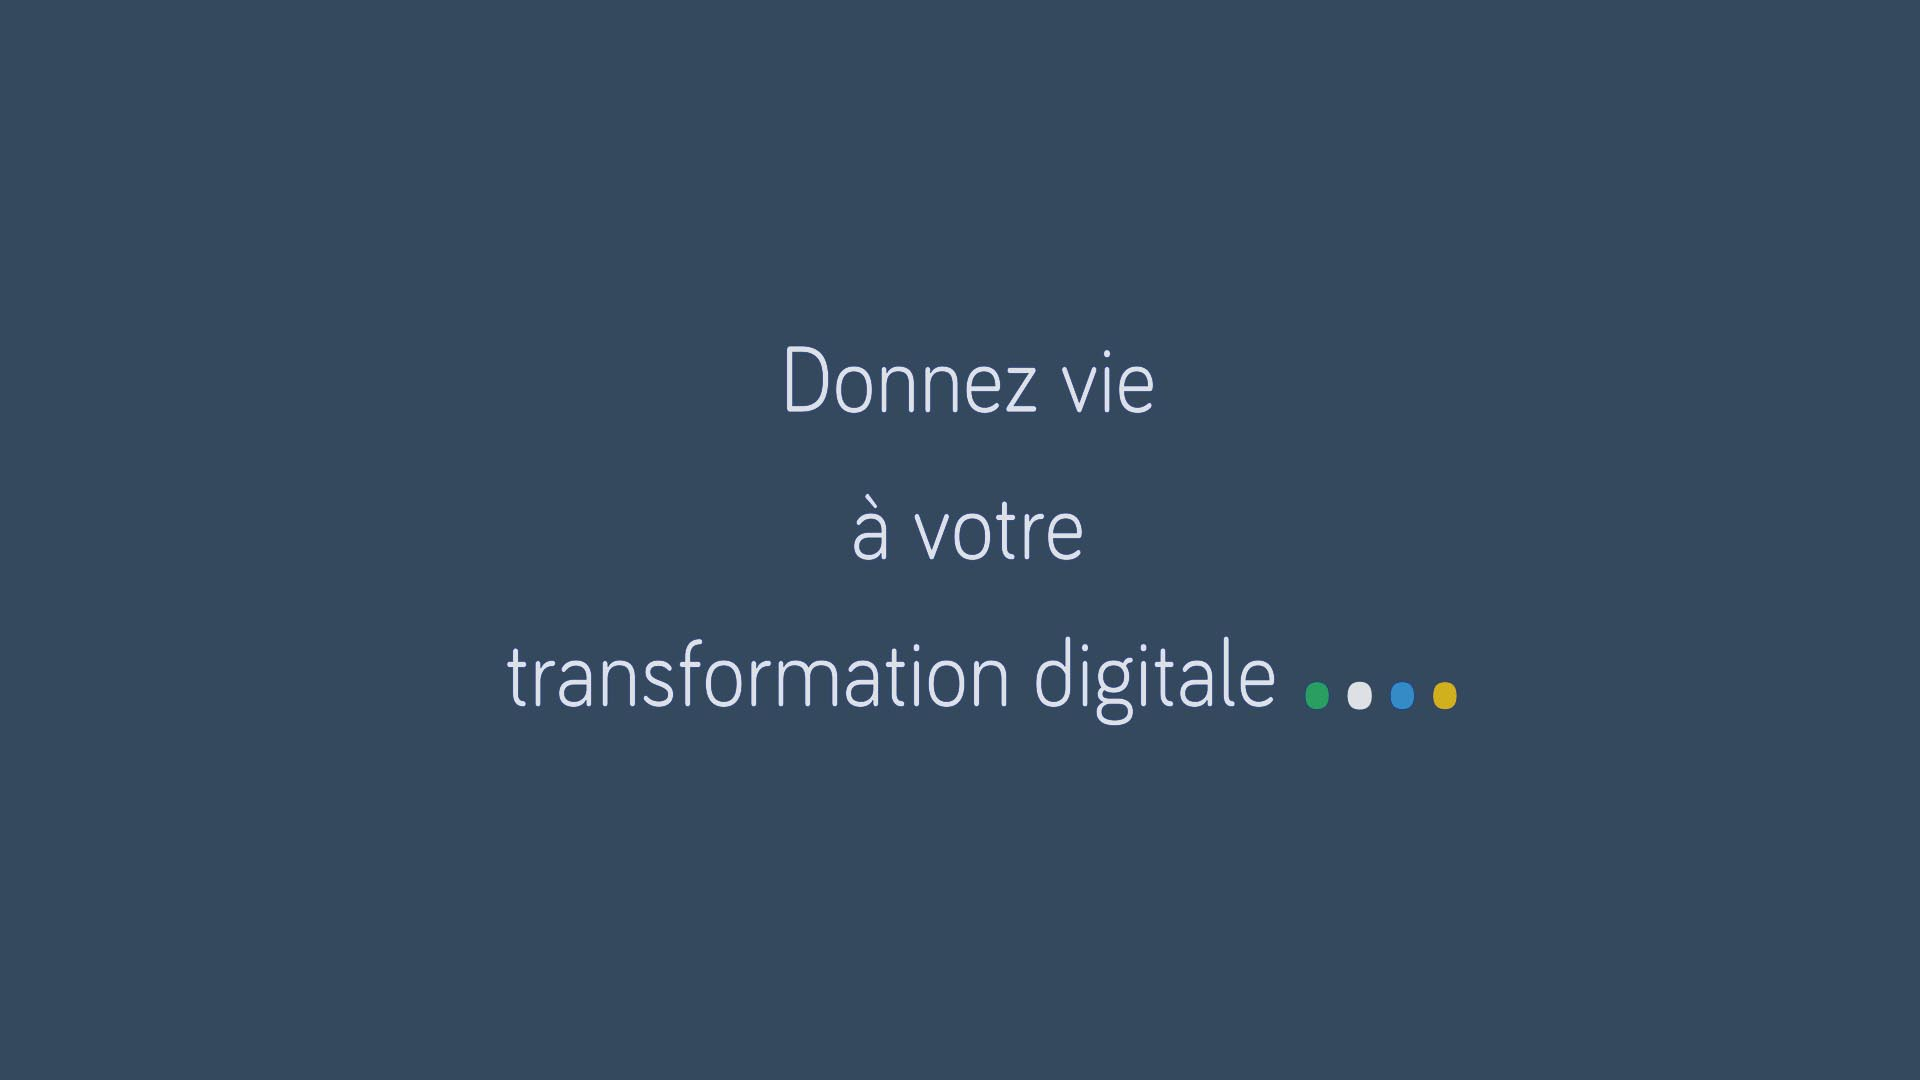 Conseil et solutions digitales & mobiles innovantes